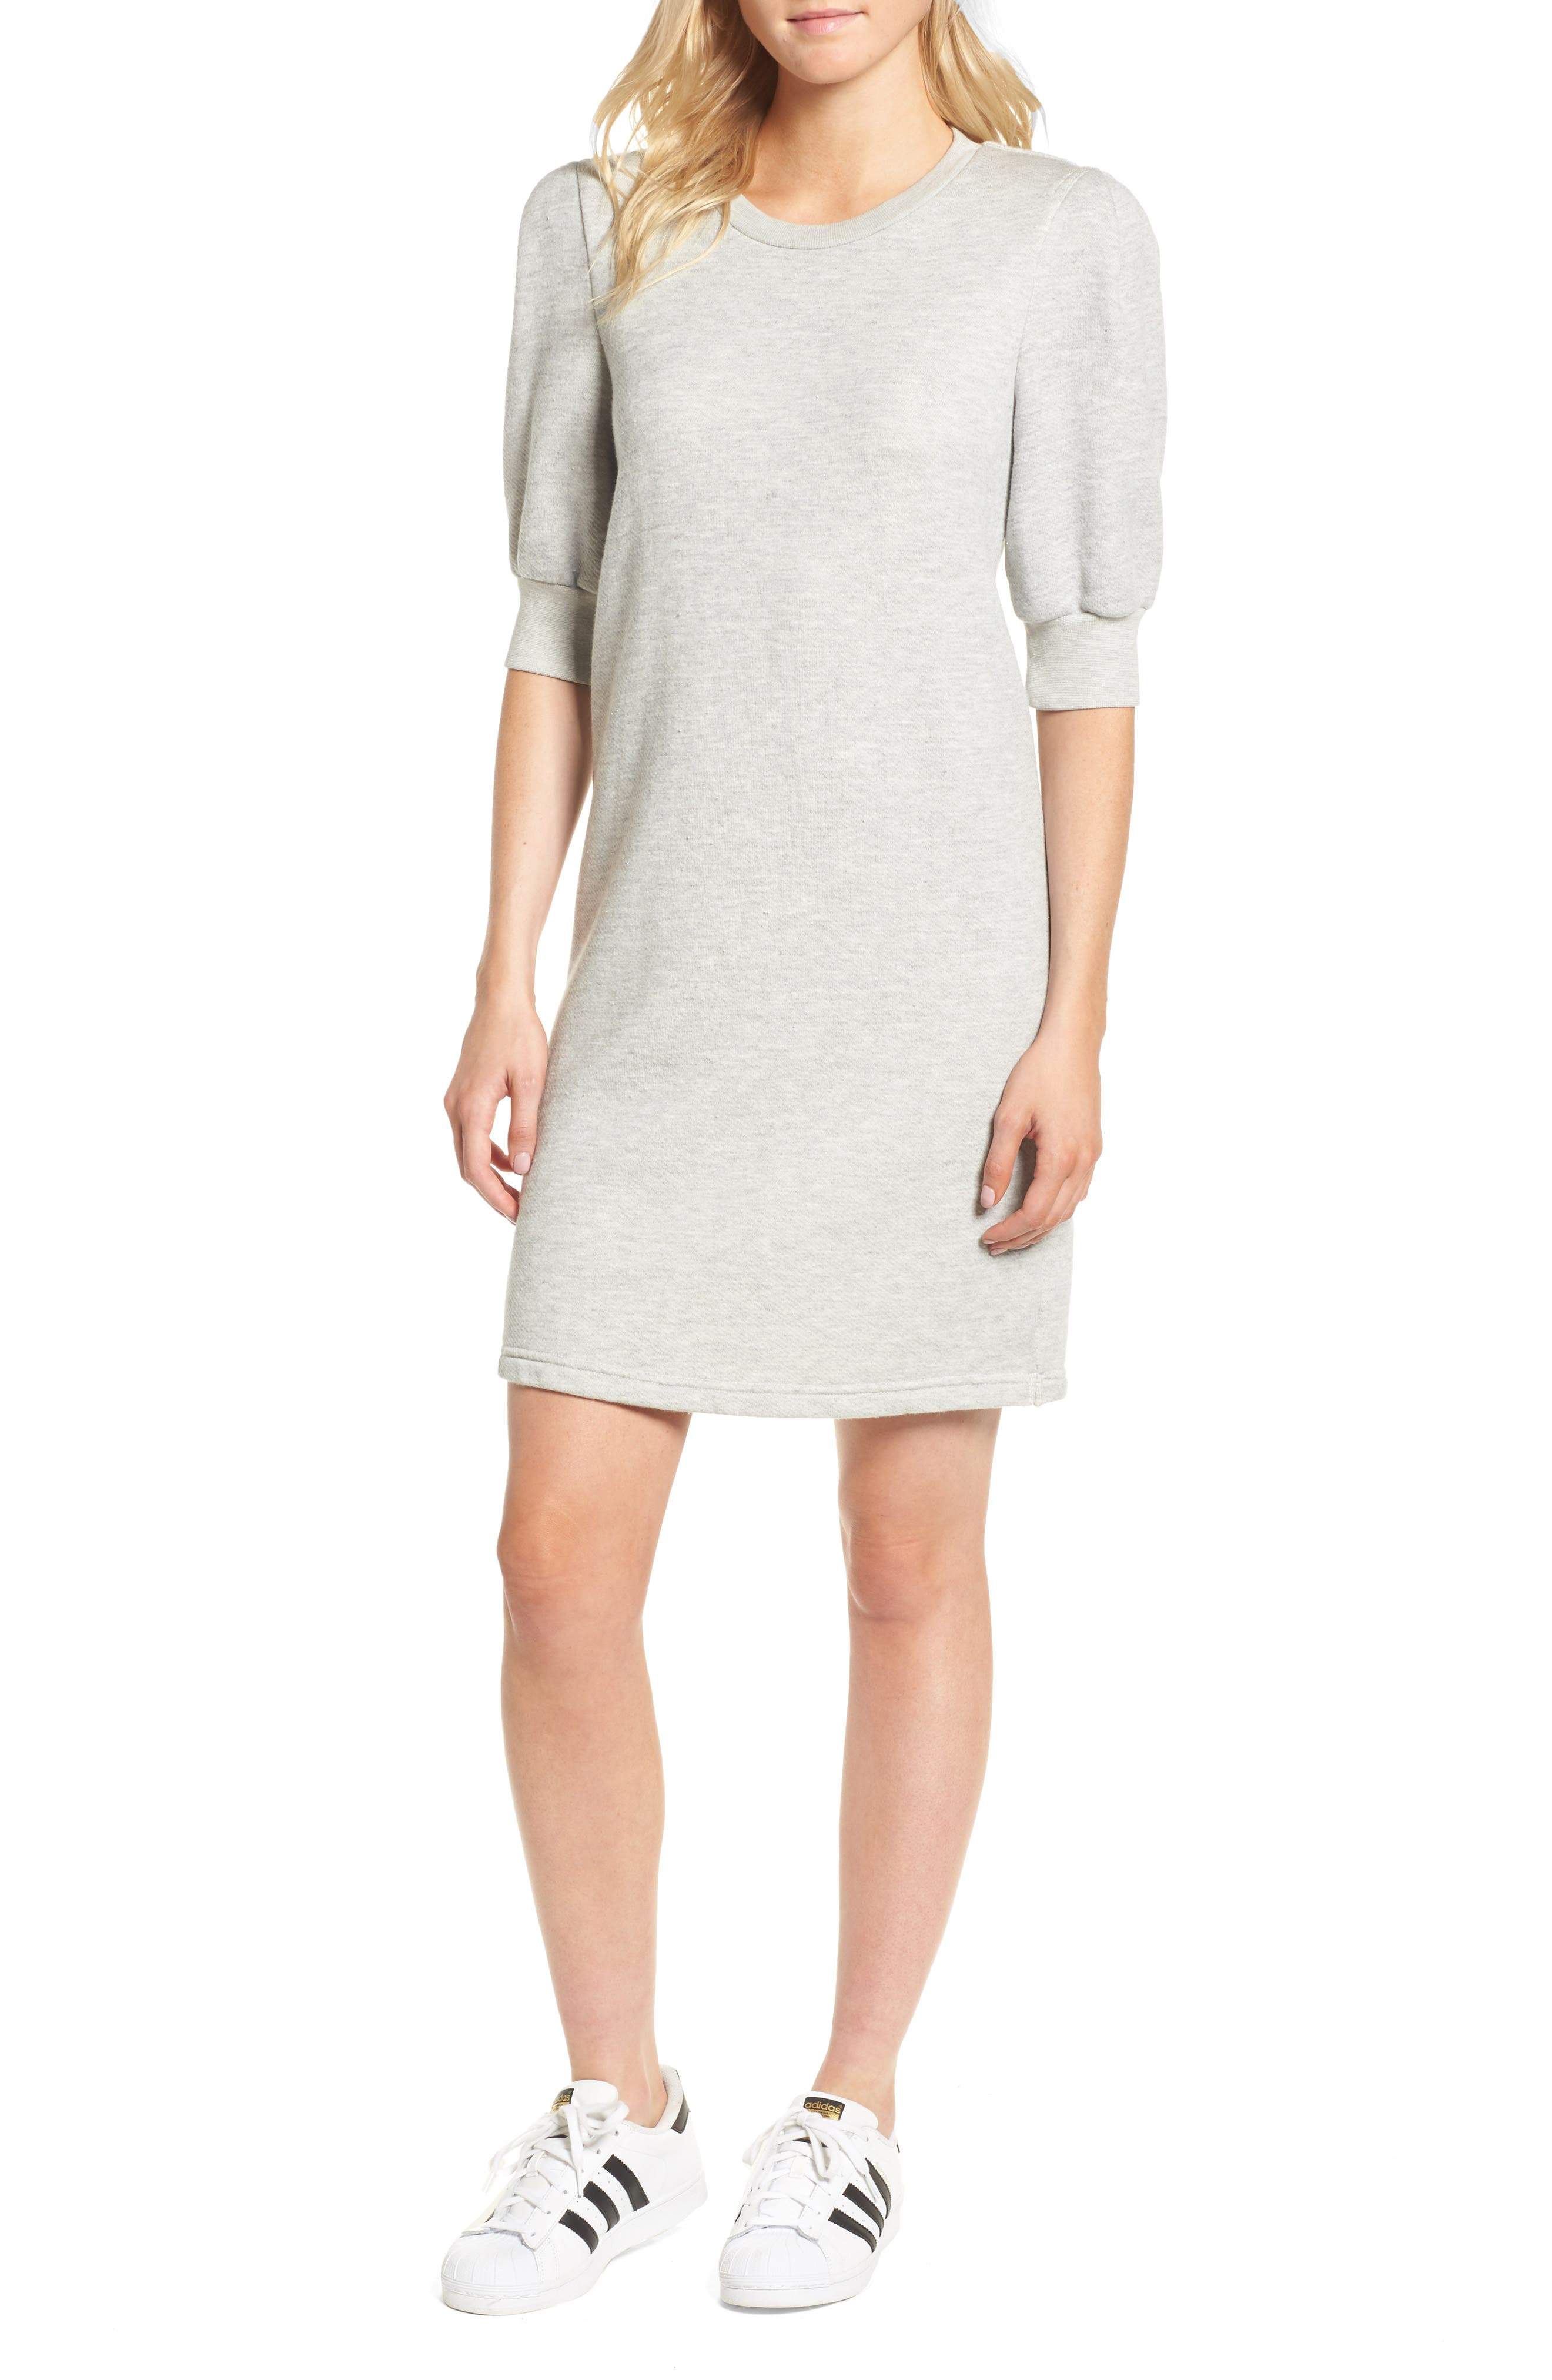 The Pleat Sweatshirt Dress,                         Main,                         color, 062